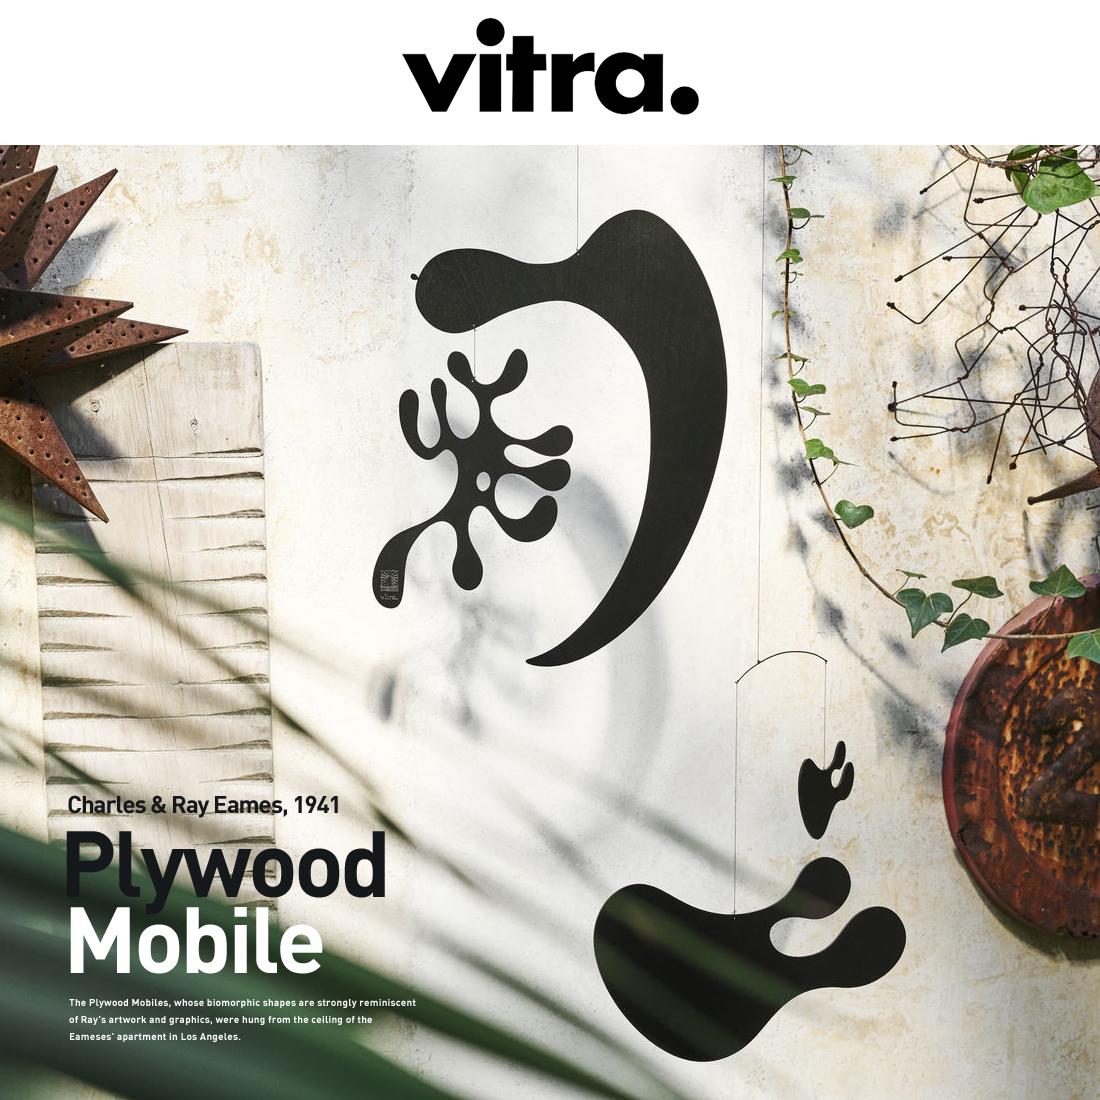 【Vitra ヴィトラ】 Plywood Mobile A,Bモビール インテリア 飾り【コンビニ受取対応商品】